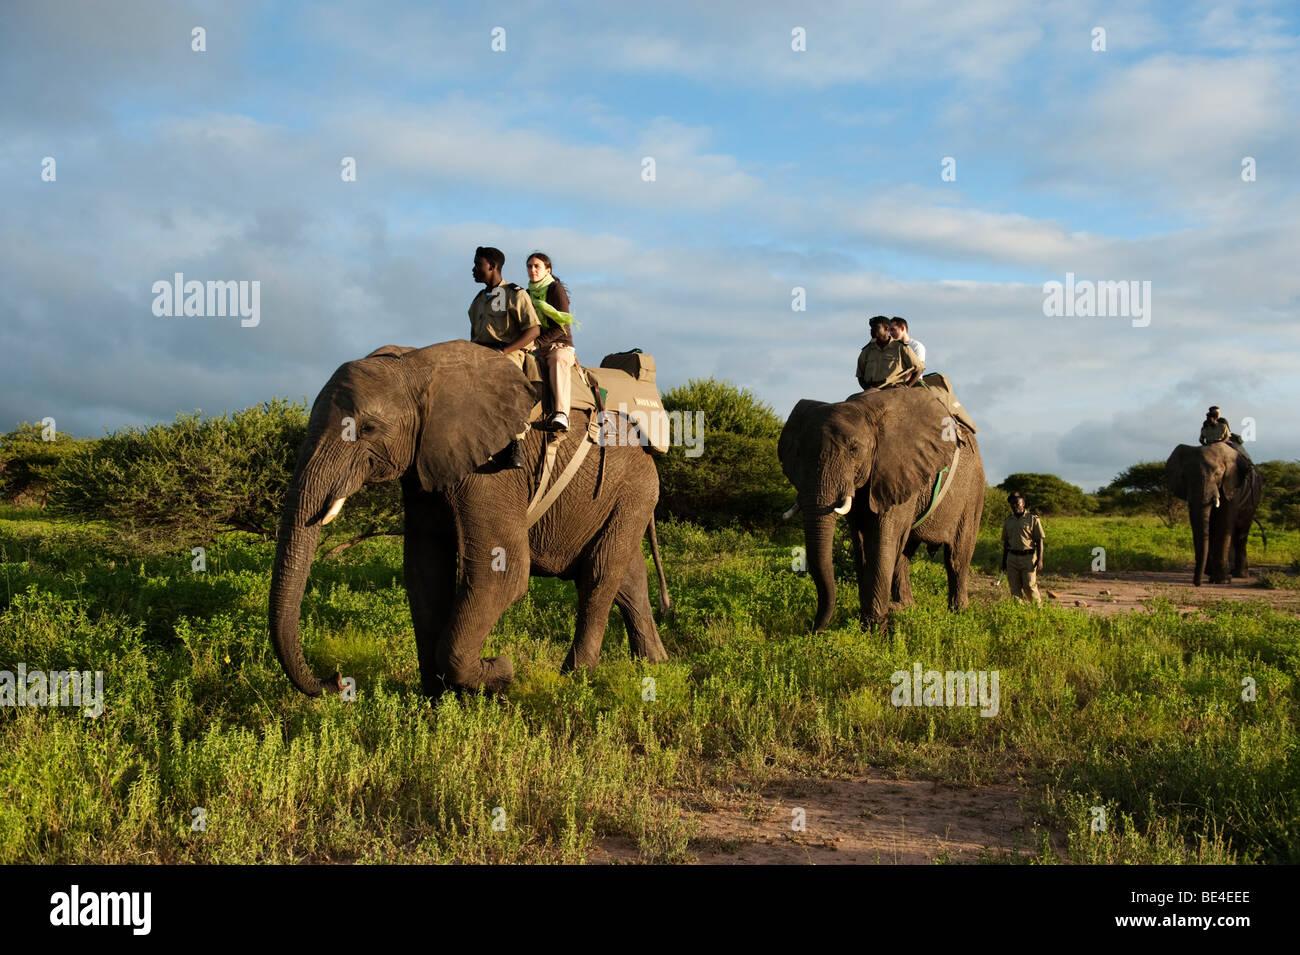 Elephant Back Safari, Kapama Game Reserve, Greater Kruger National Park, South Africa - Stock Image